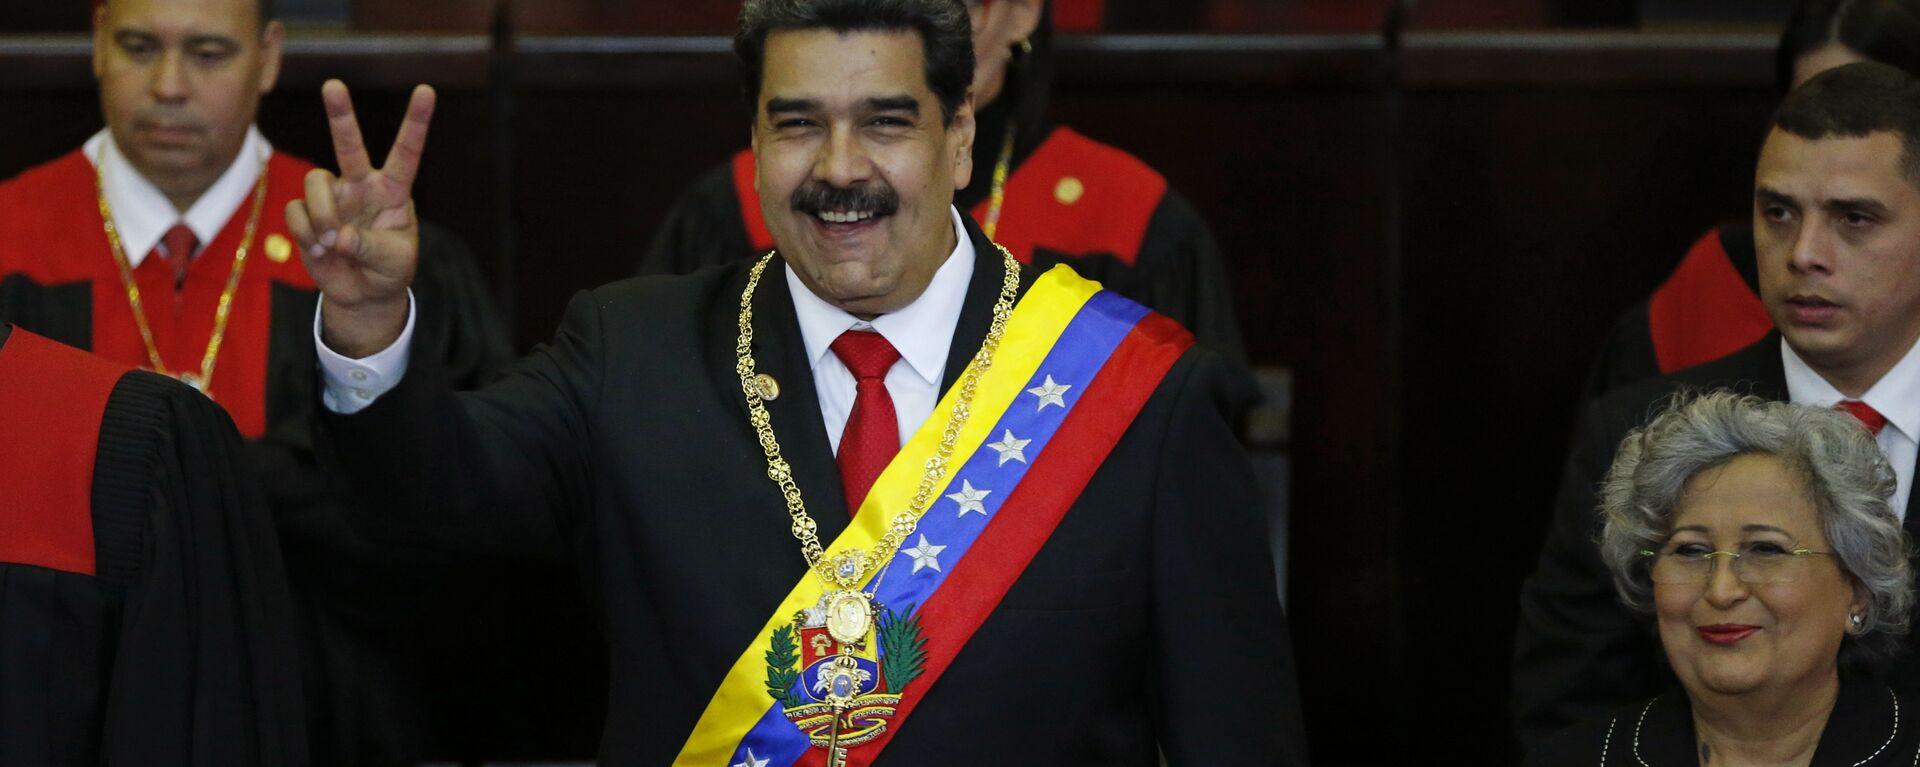 Nicolás Maduro asume su segundo mandato presidencial  - Sputnik Mundo, 1920, 12.05.2021